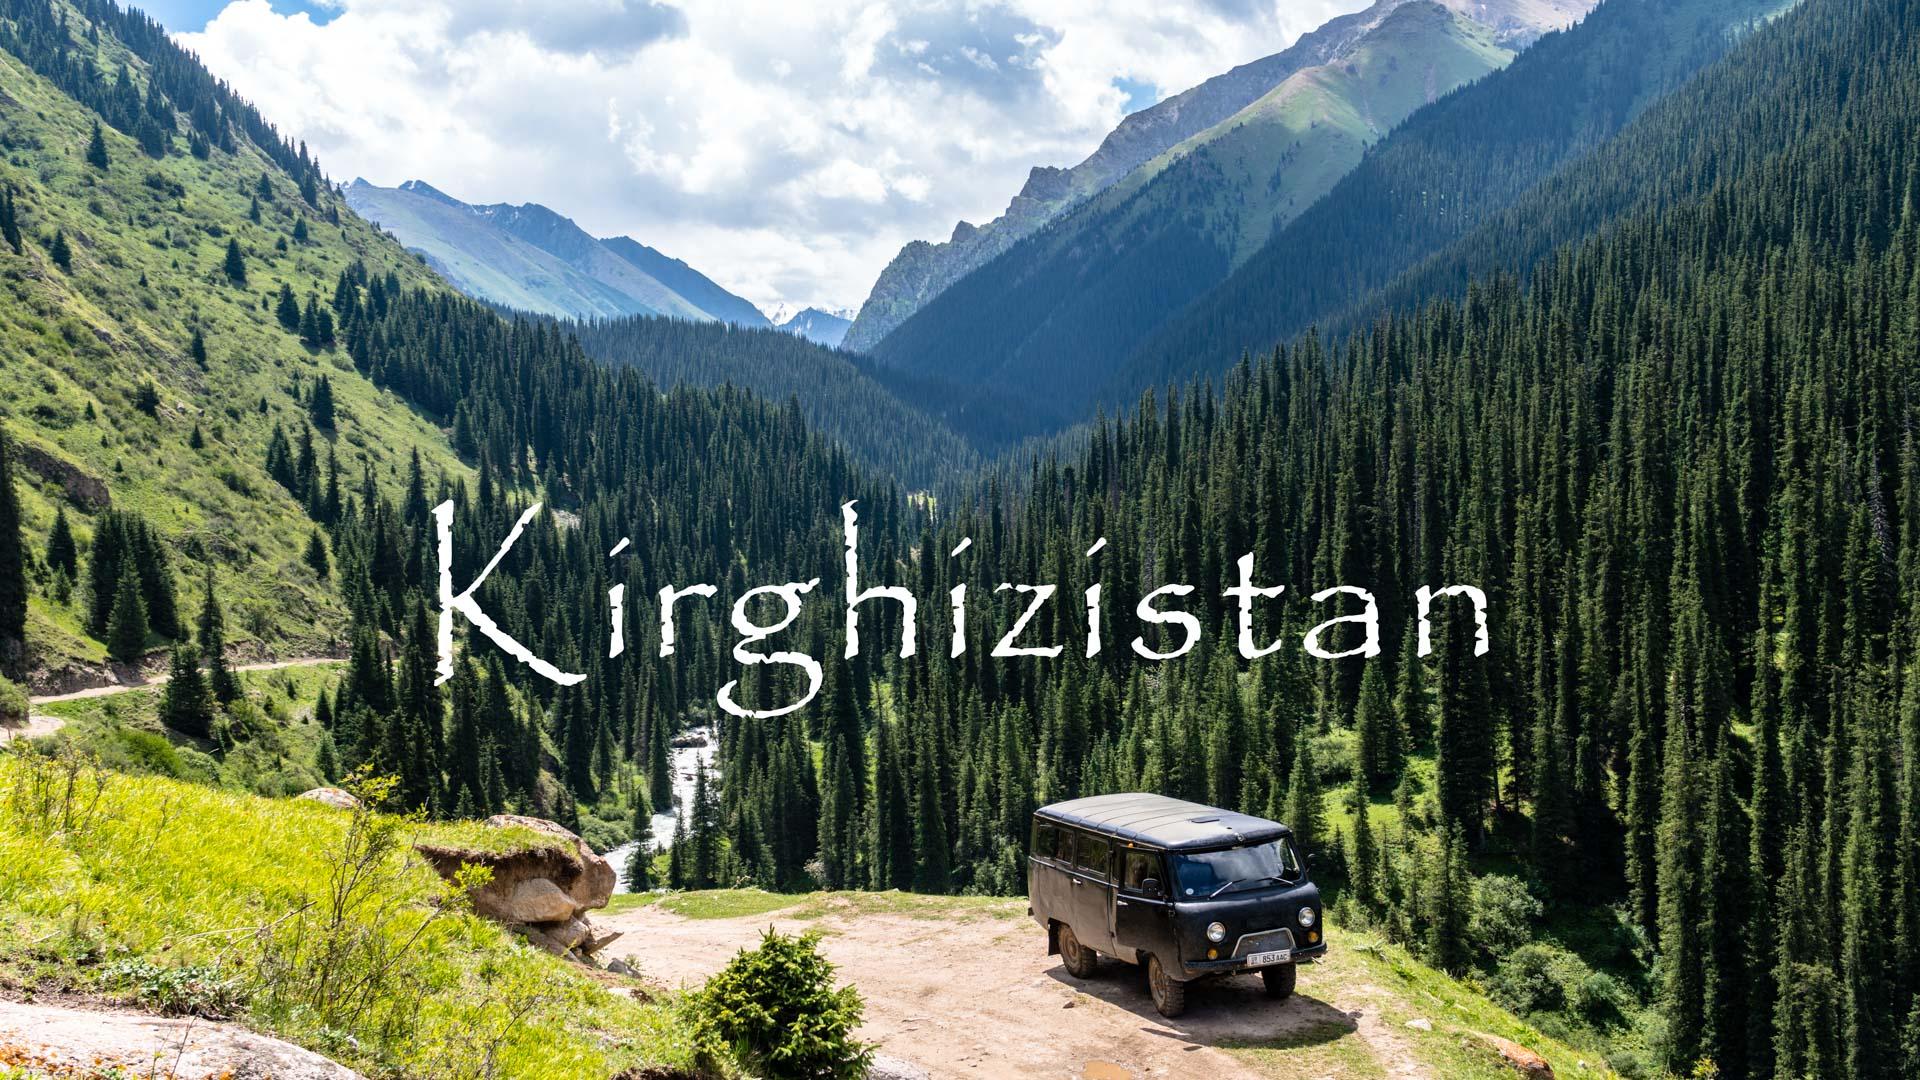 SerialHikers stop autostop world monde tour hitchhiking aventure adventure alternative travel voyage sans avion no fly Kyrgyzstan Kirghizistan roadtrip destination guide